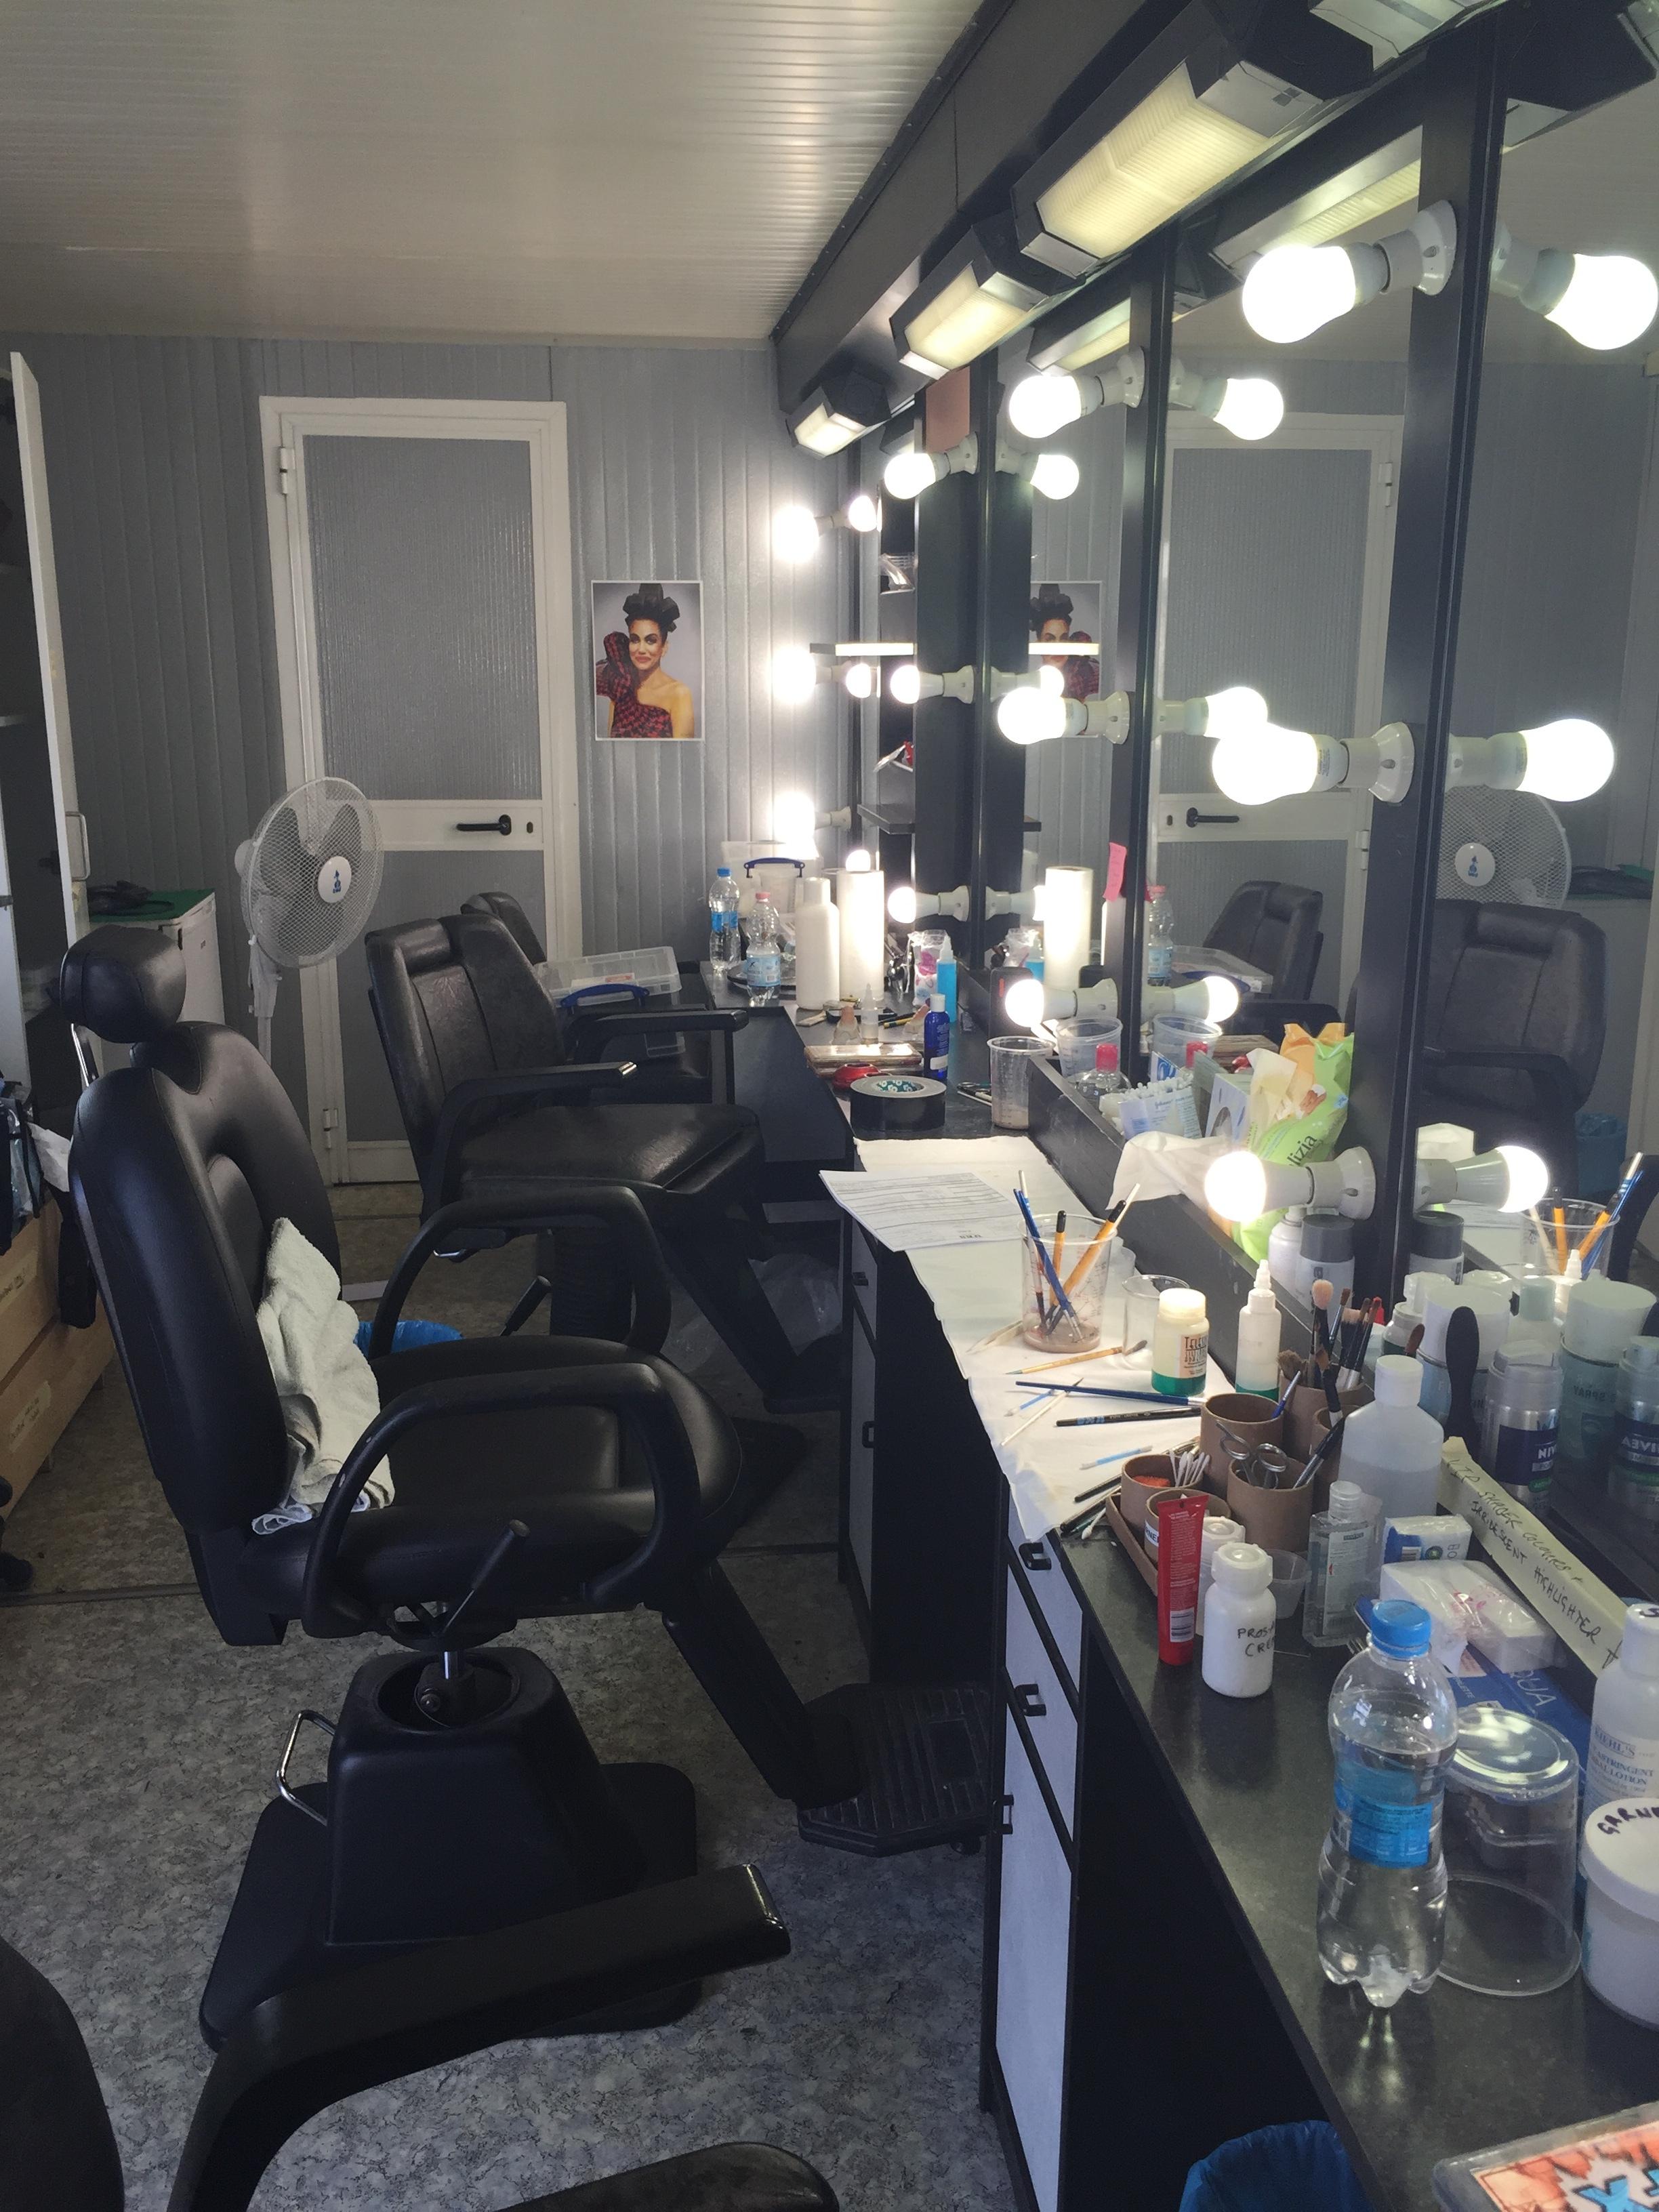 makeup room zoolander2 2015